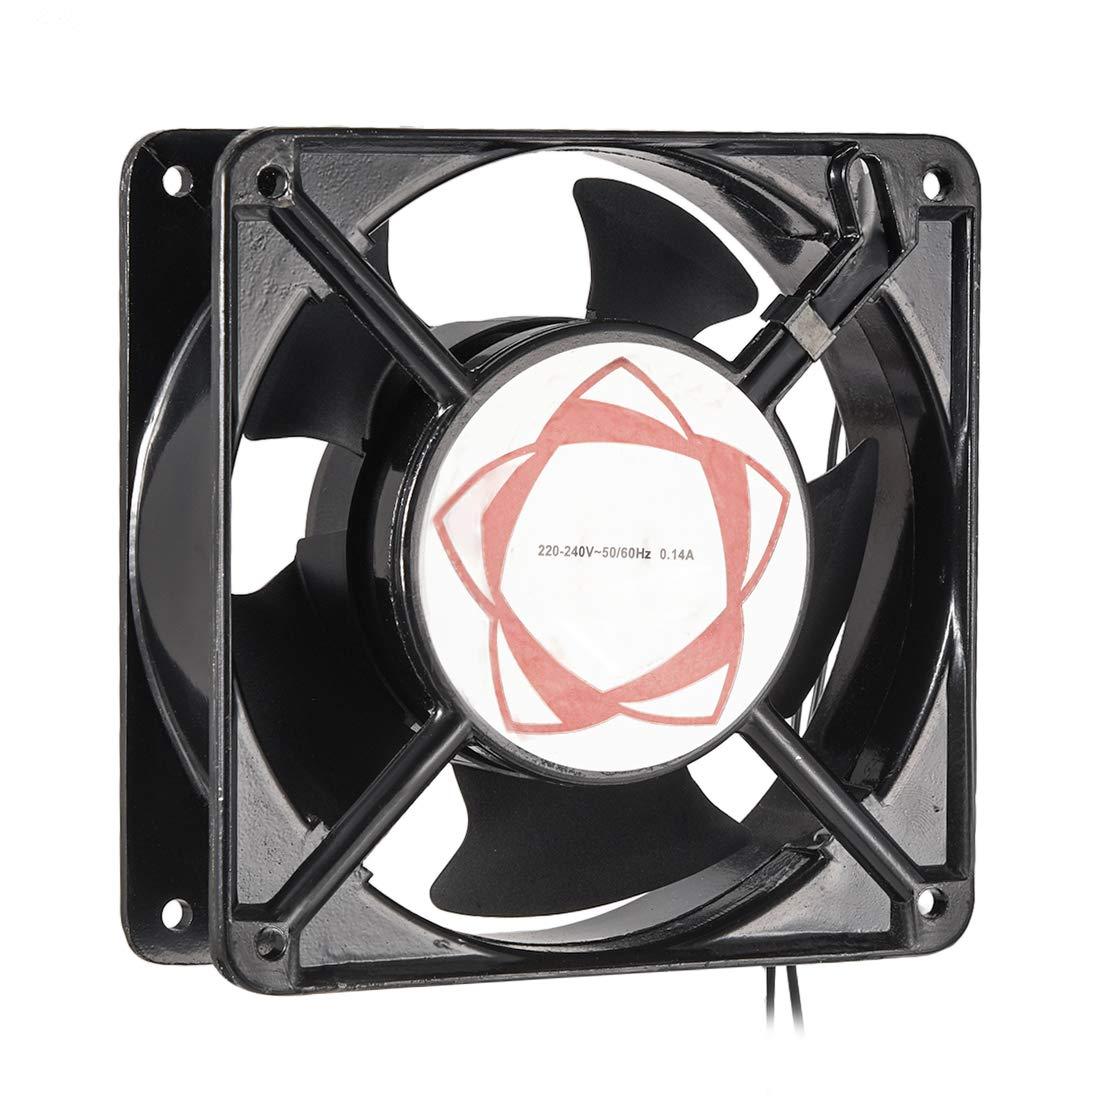 uxcell Cooling Fan 120mm x 120mm x 38mm DT200A AC 220-240V 0.14A Long Life Sleeve Bearings